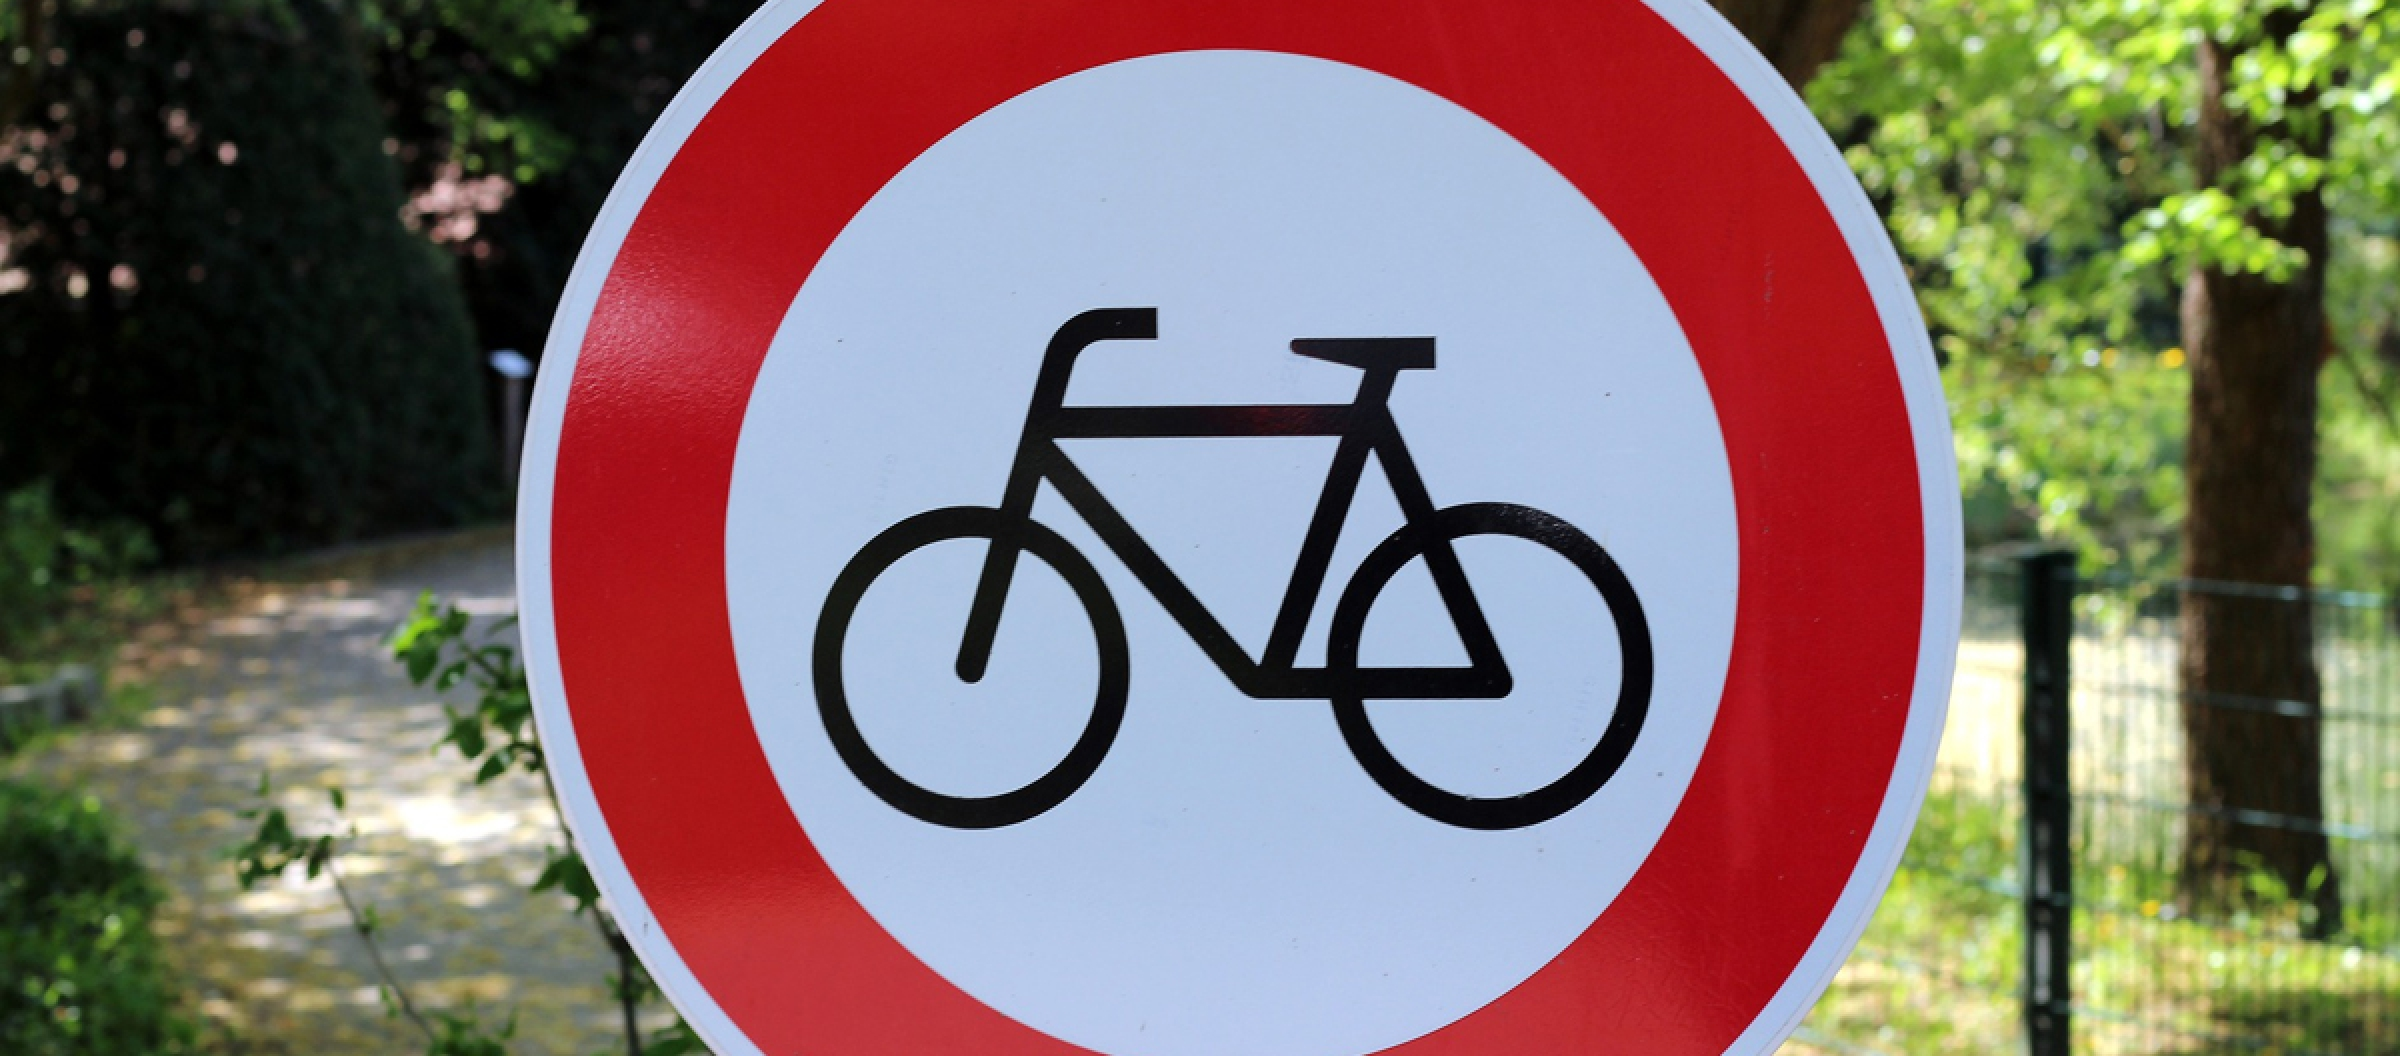 Signage Traffic Signs